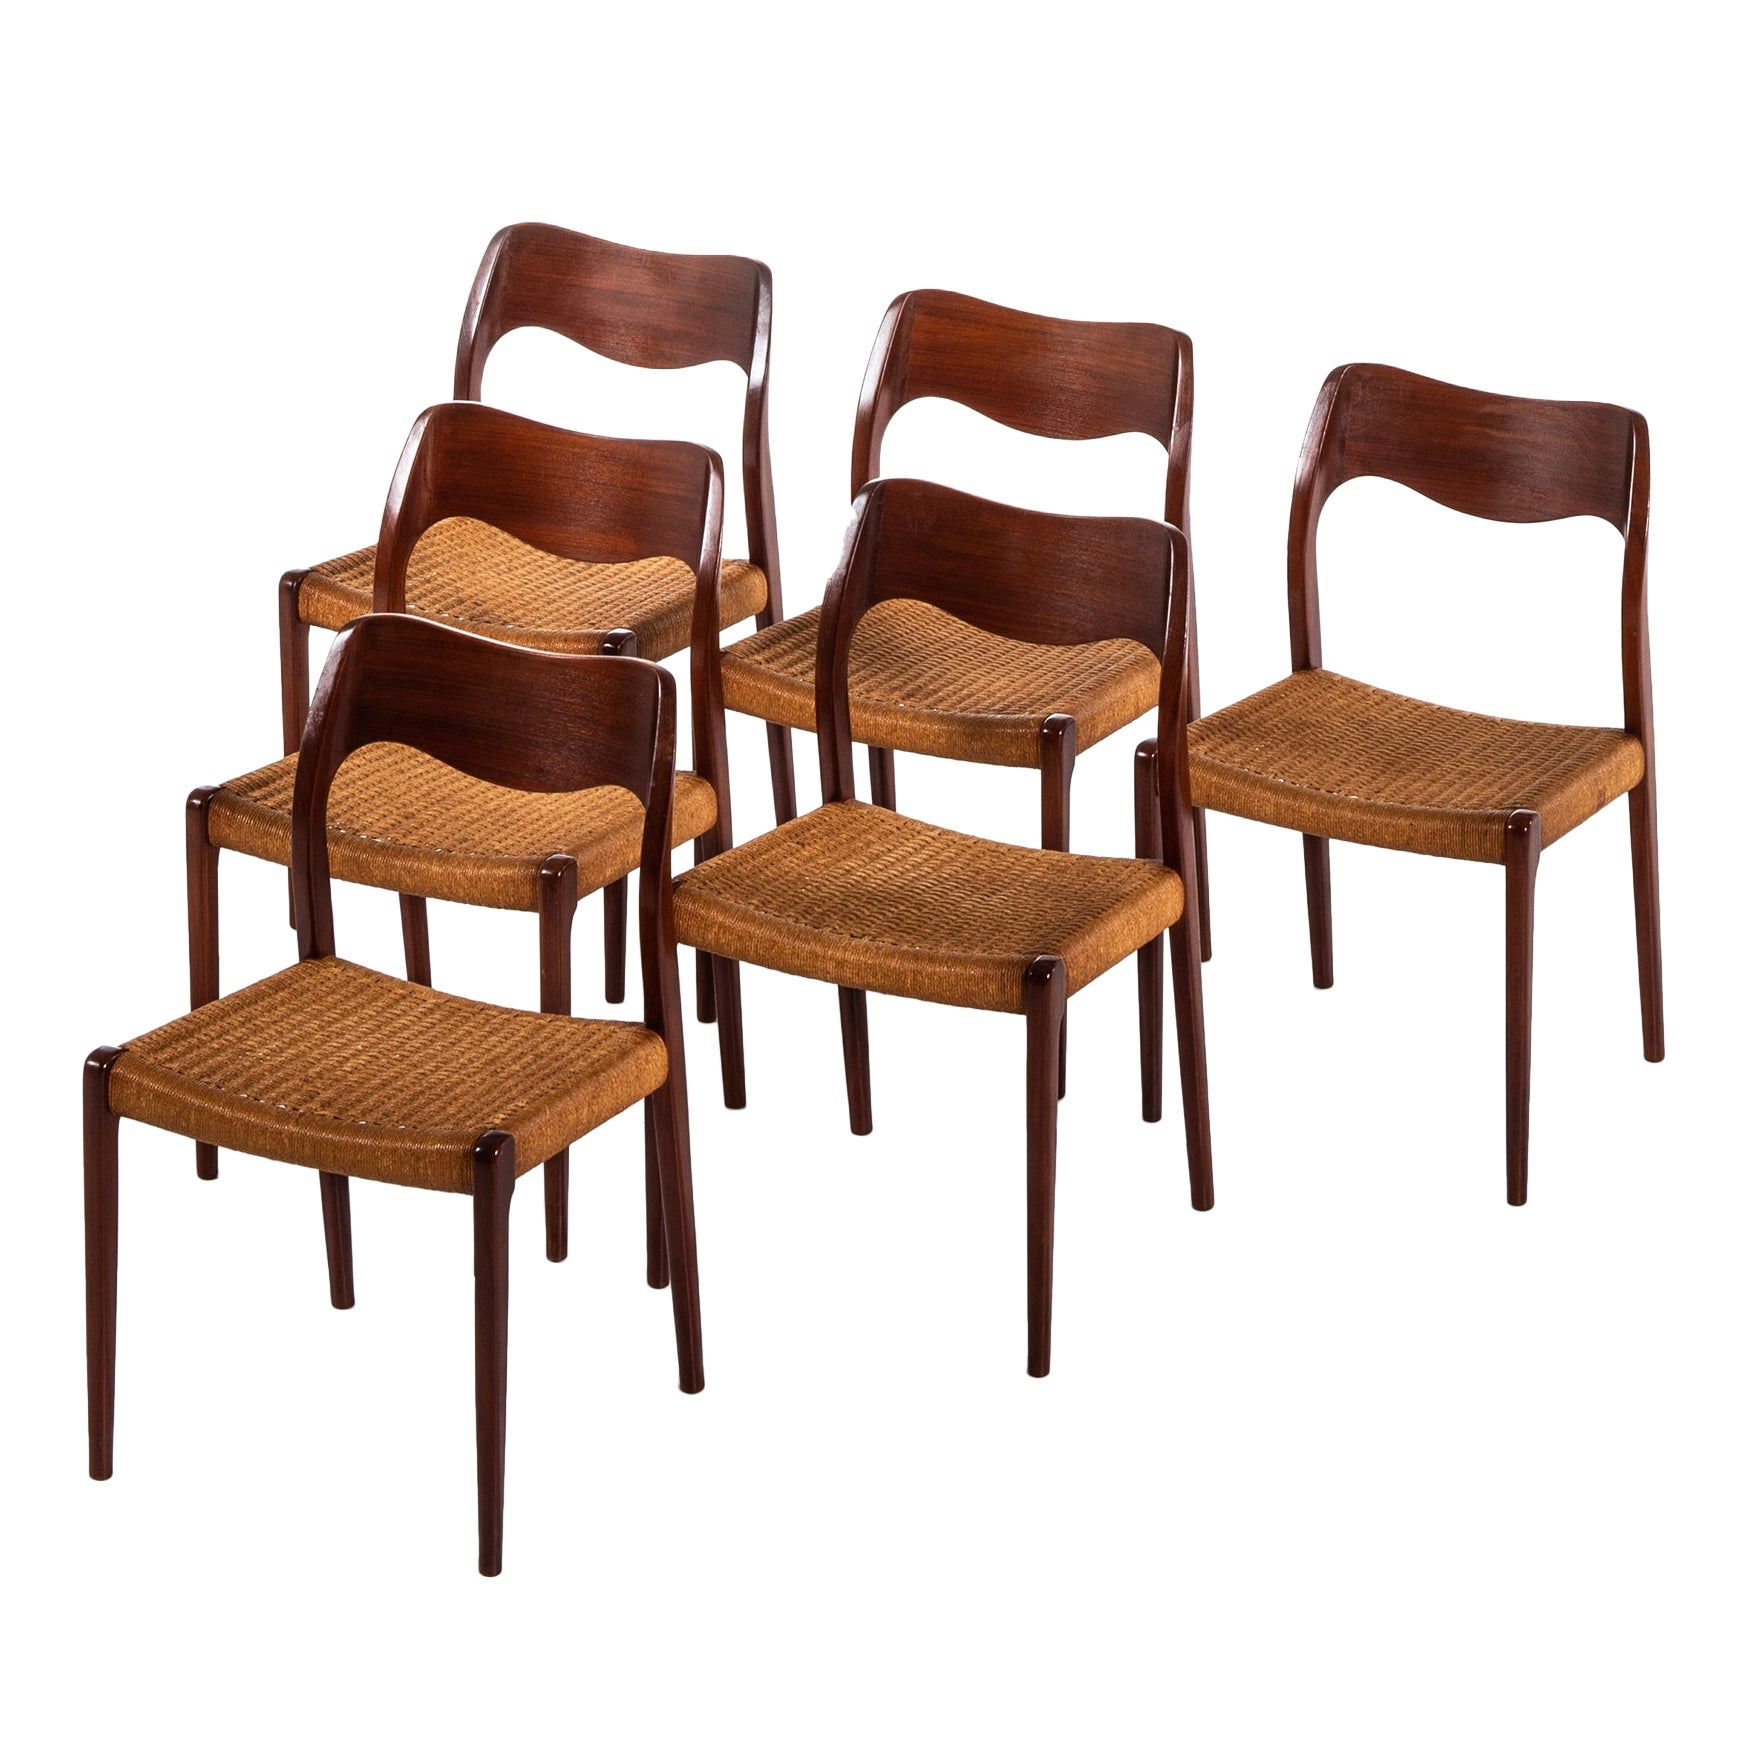 Niels O. Møller Dining Chairs Model 71 by J.L. Møllers Møbelfabrik in Denmark